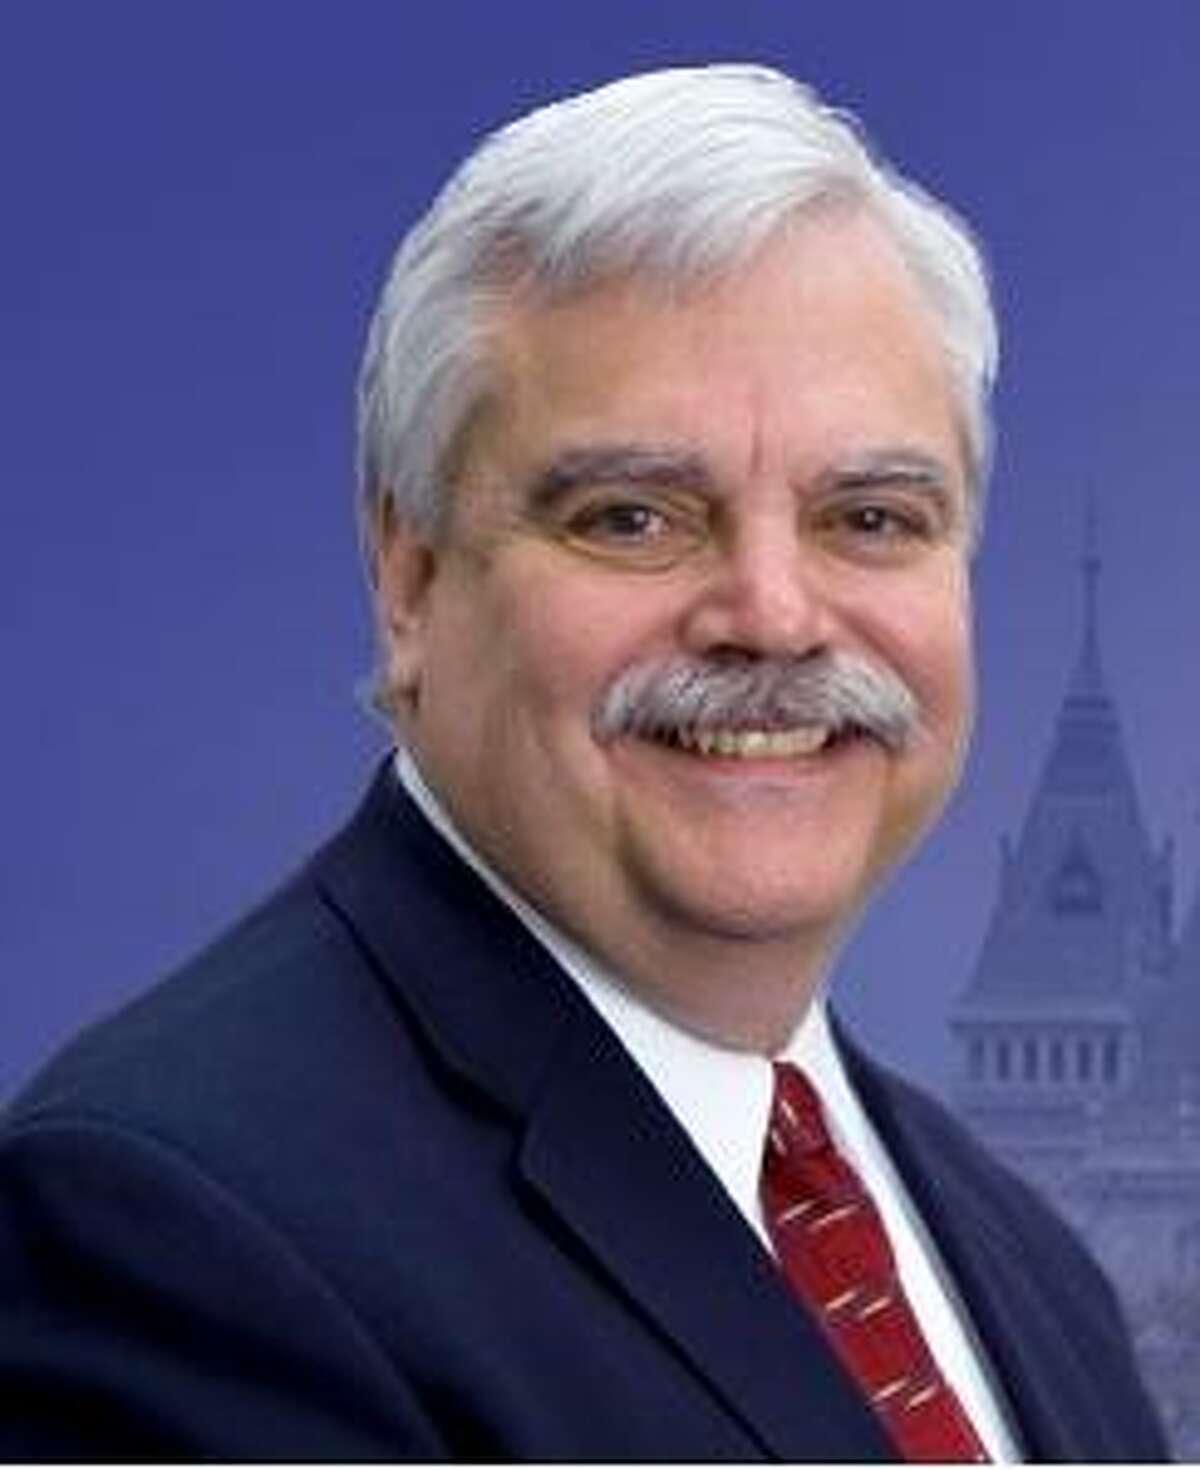 State Rep. Bob Godfrey, D-Danbury Legislative photo